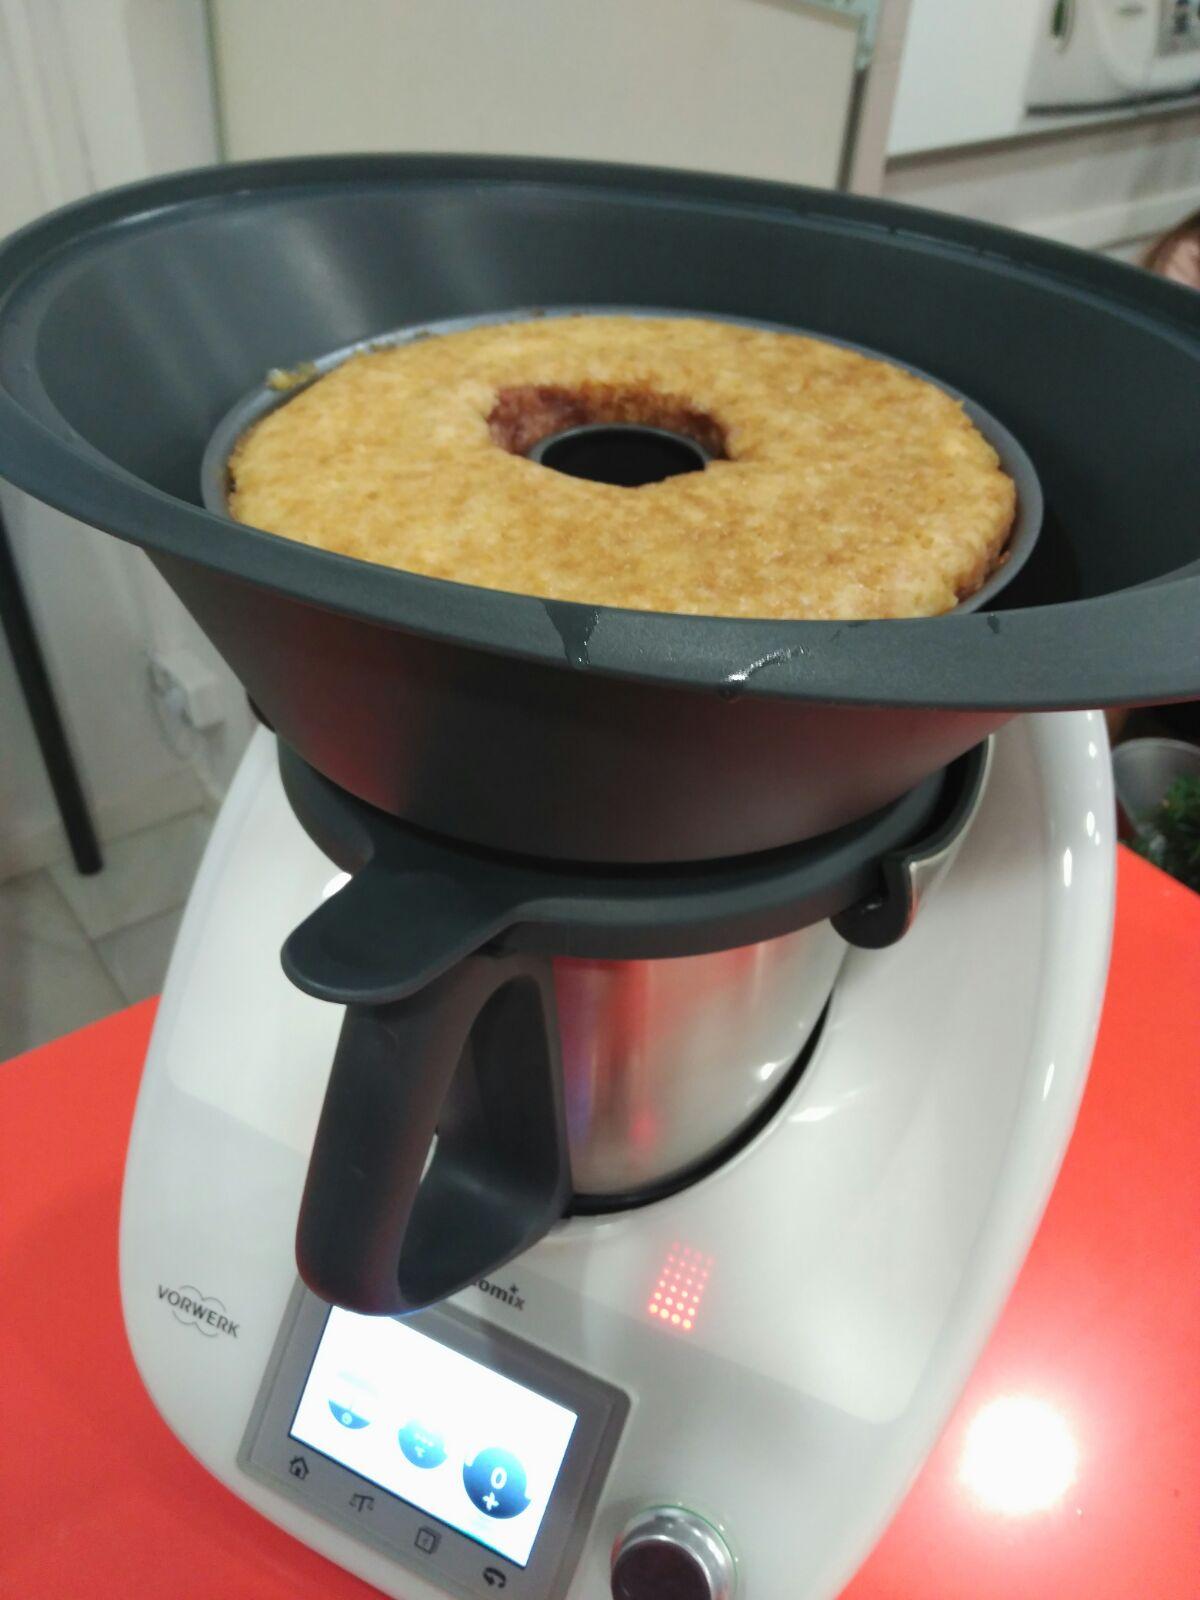 Bizcocho al vapor con mermelada de frambuesa con Thermomix®